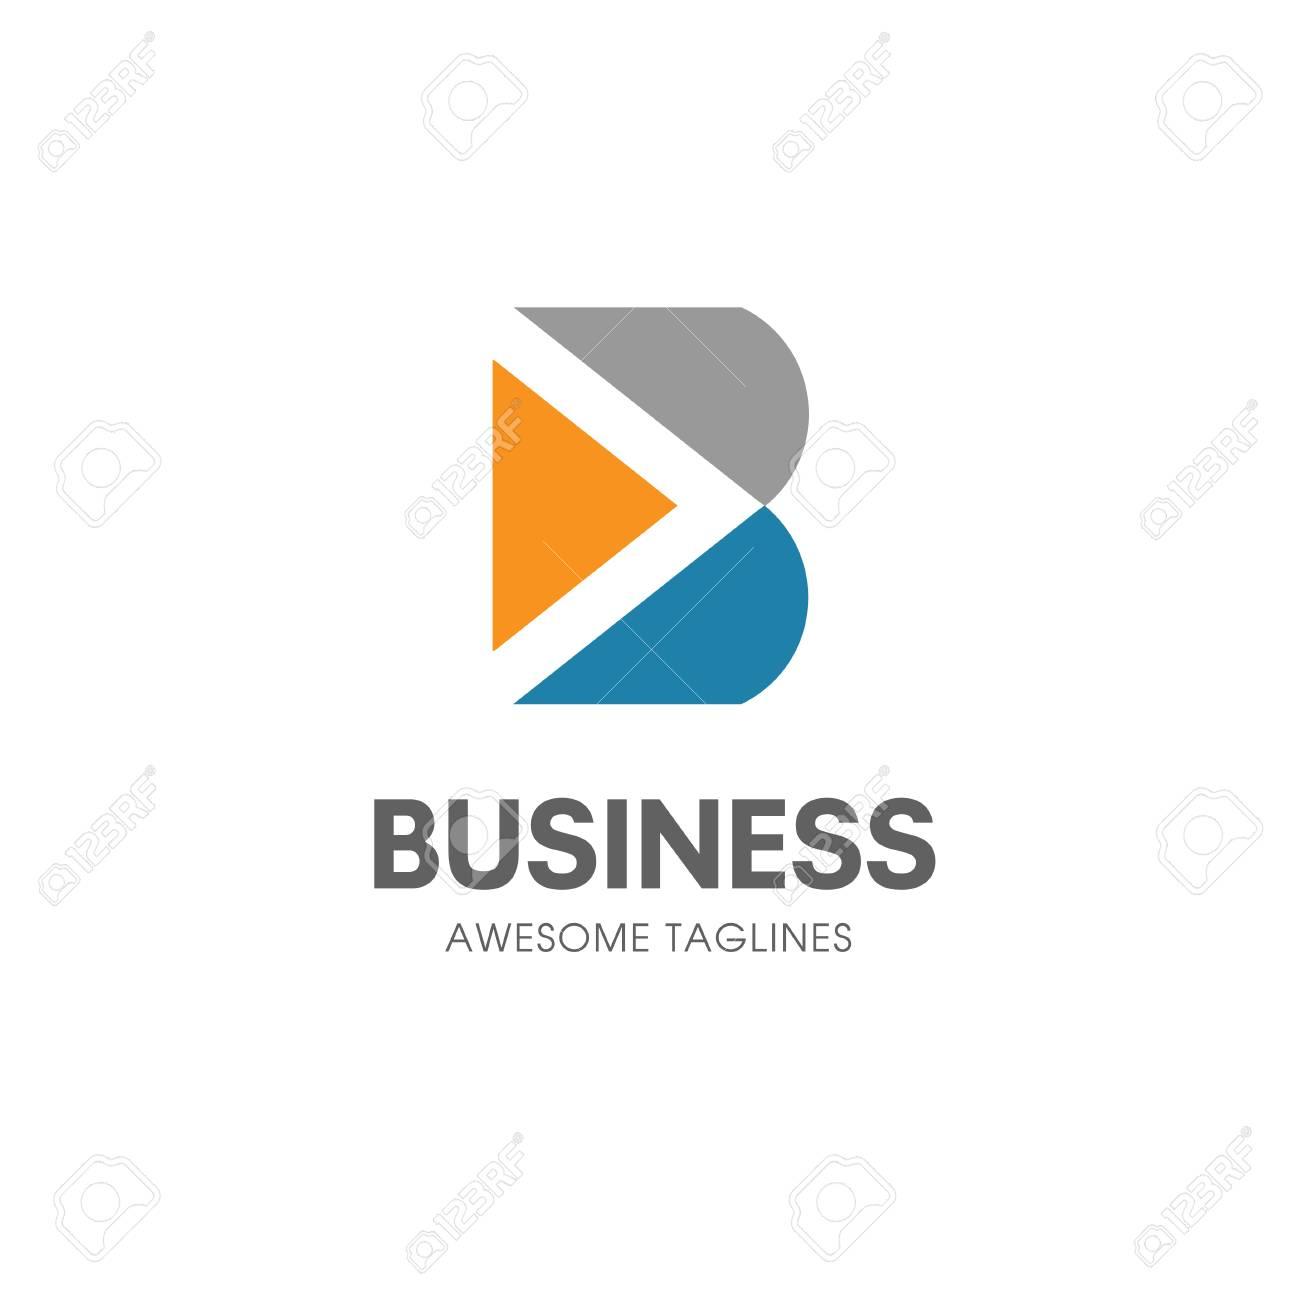 Kreatives B Brief Konzept Vektor Logo Vorlage Abstrakter